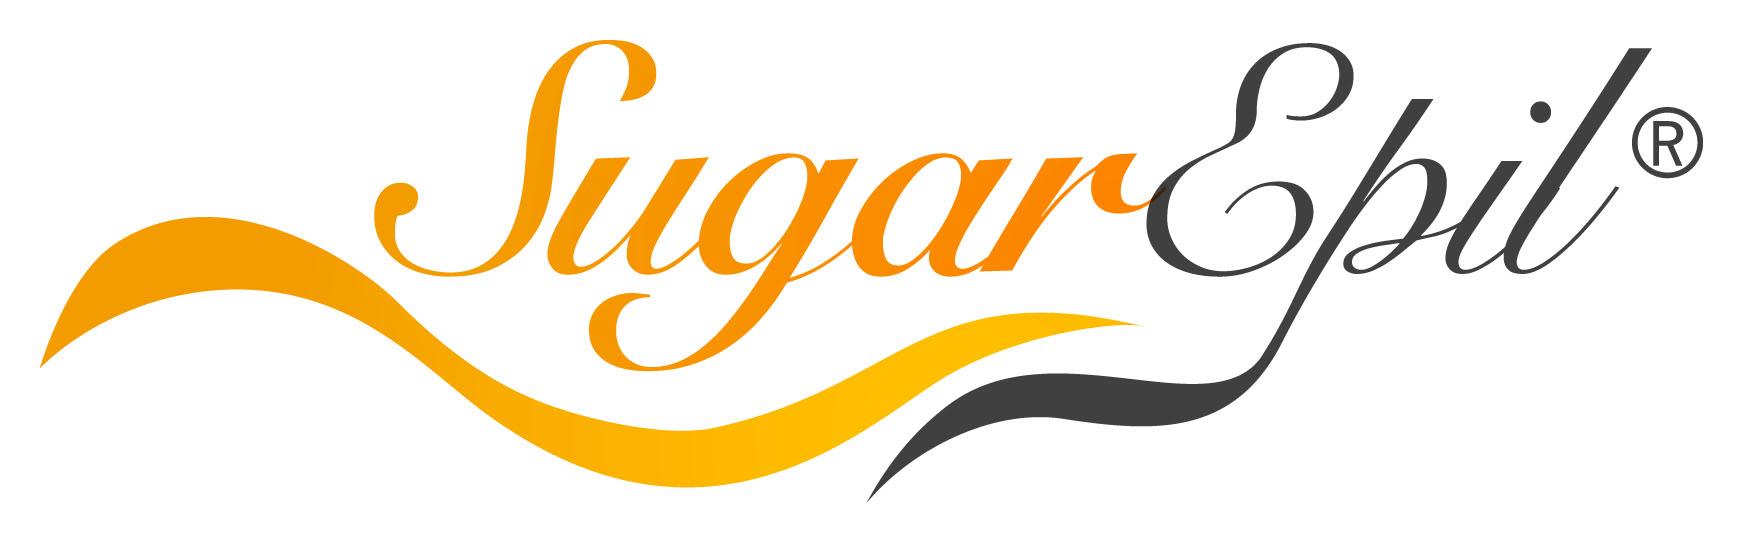 sugarEpil_ohne.jpg